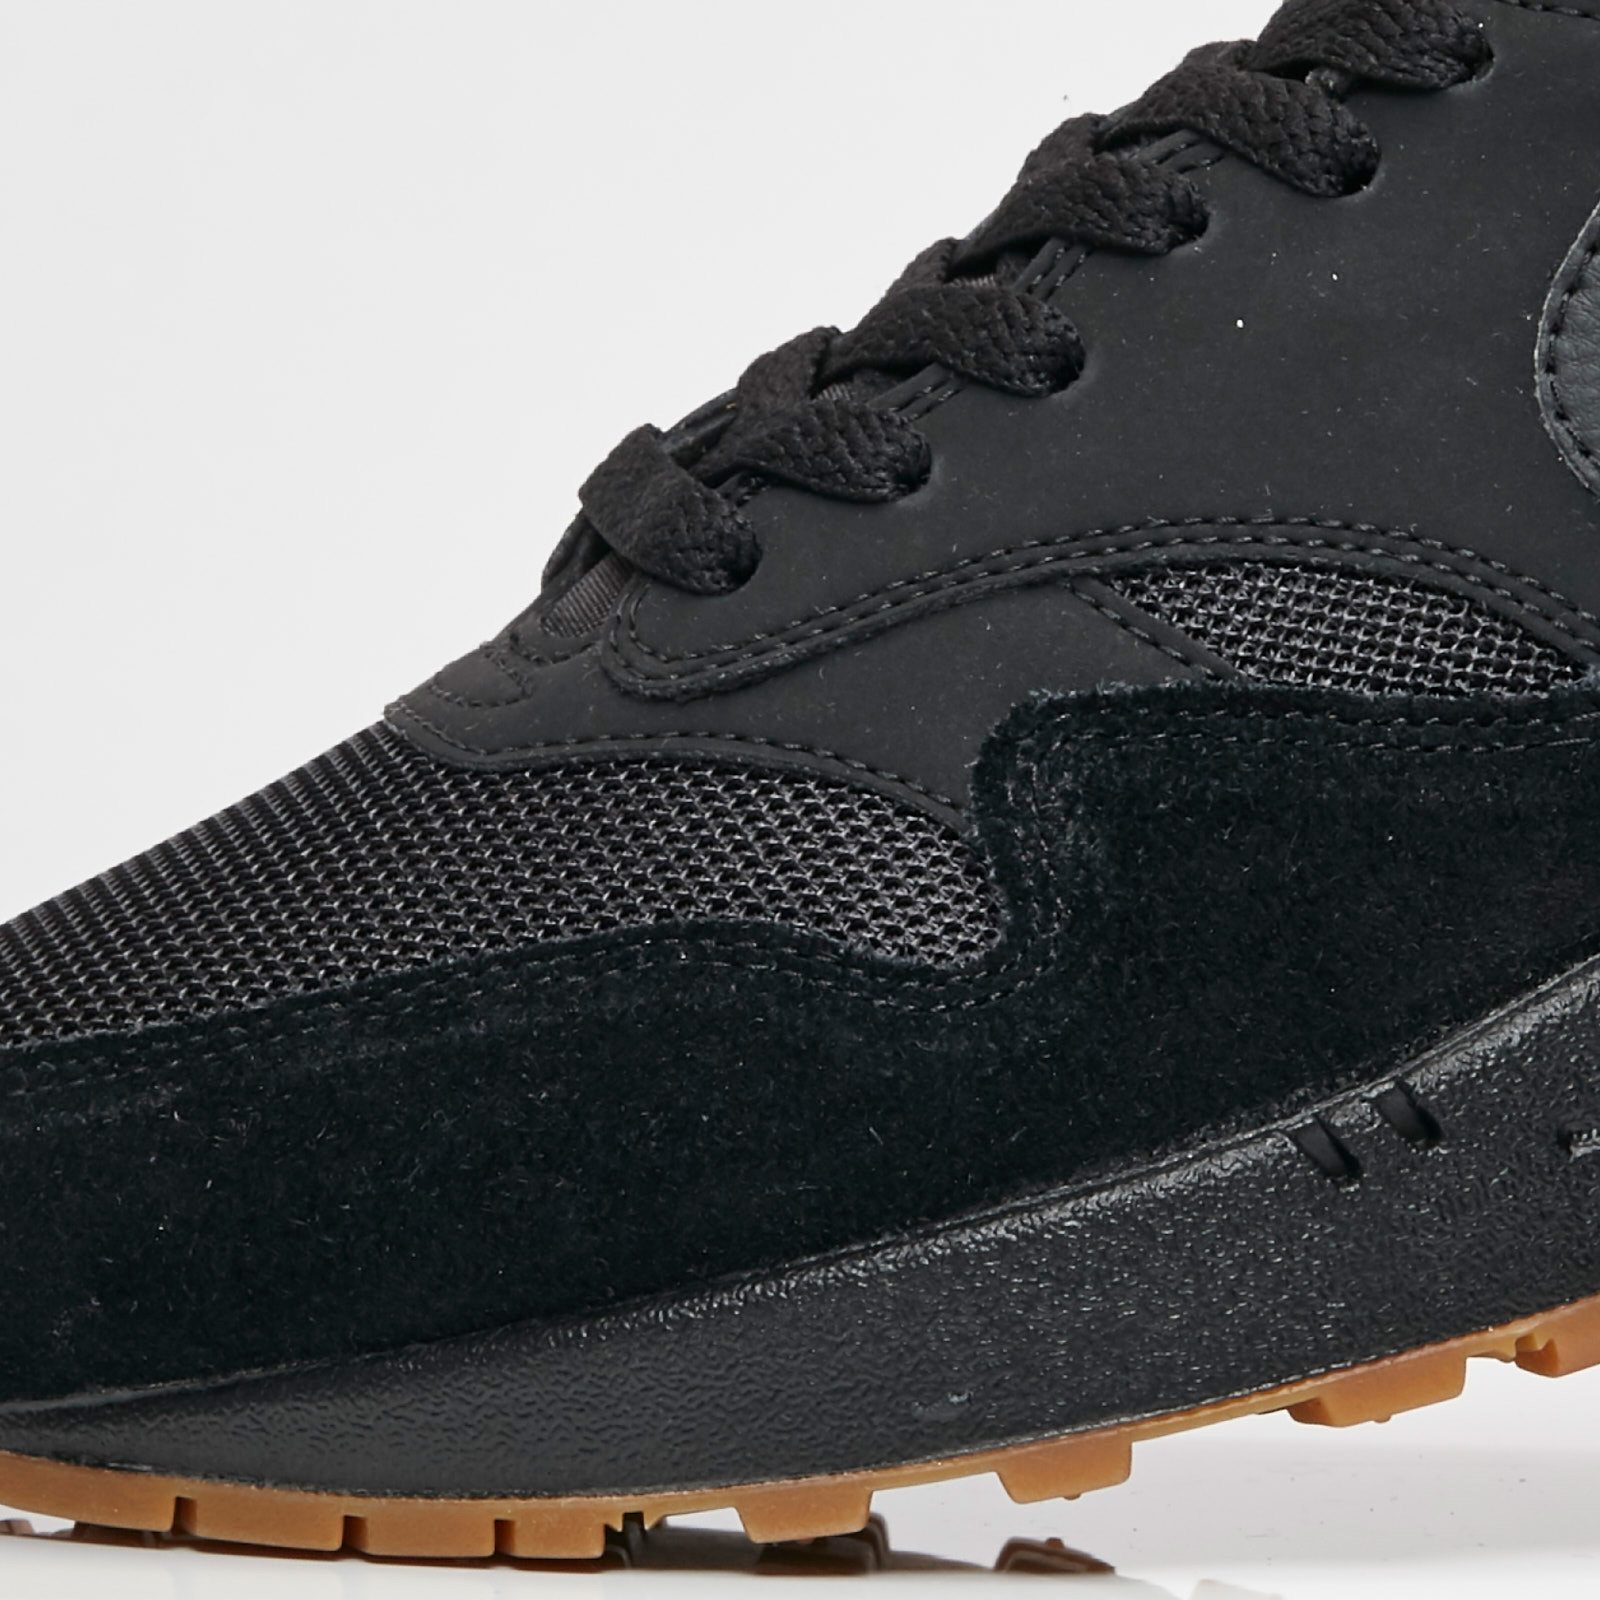 online store 08361 f3641 Nike Sportswear Air Max 1 - 6. Close